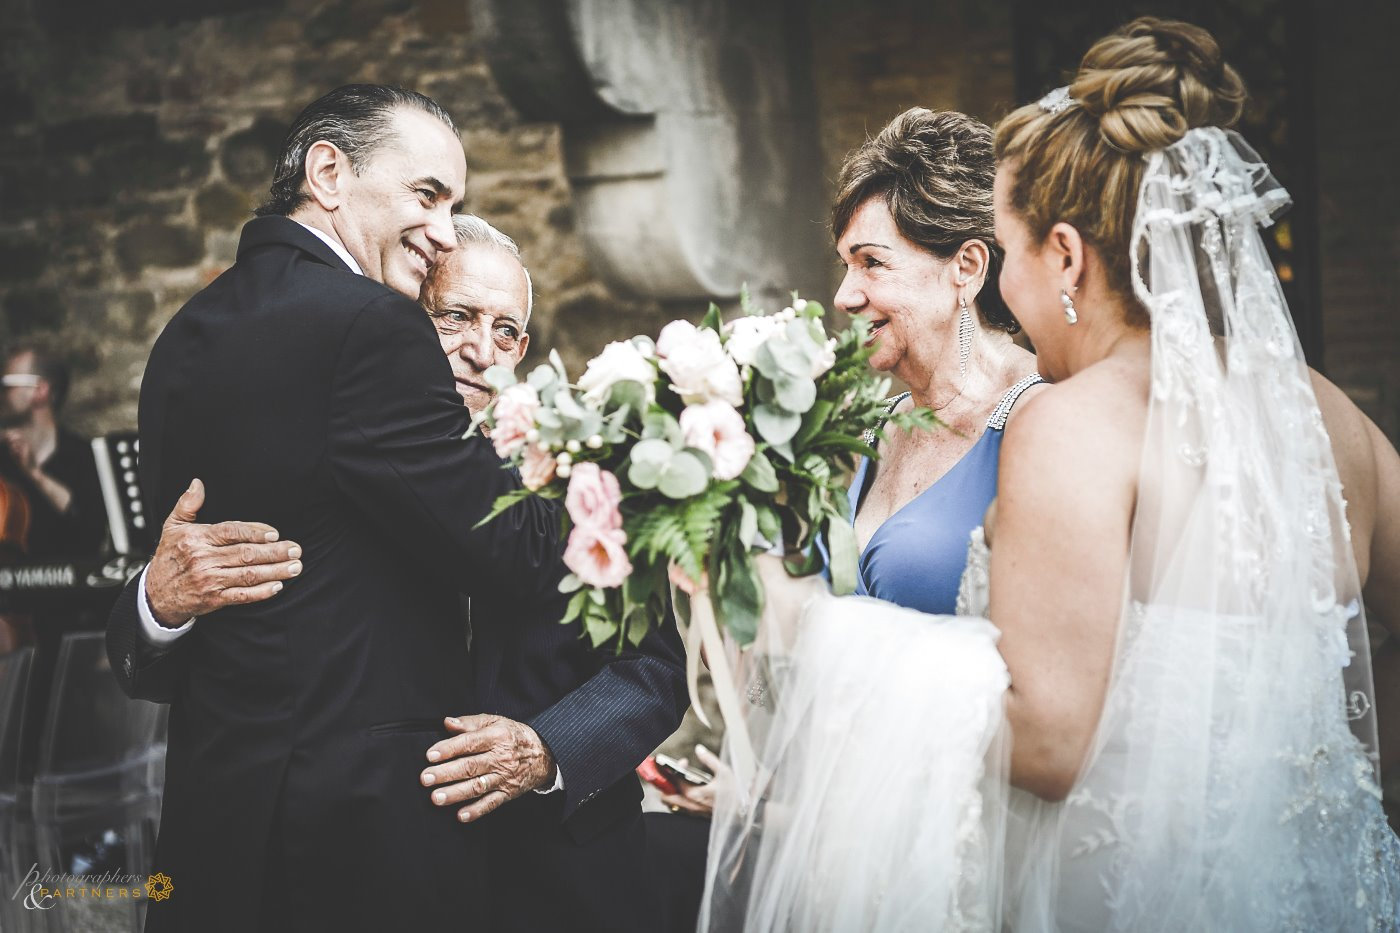 photographer_weddings_umbria_12.jpg